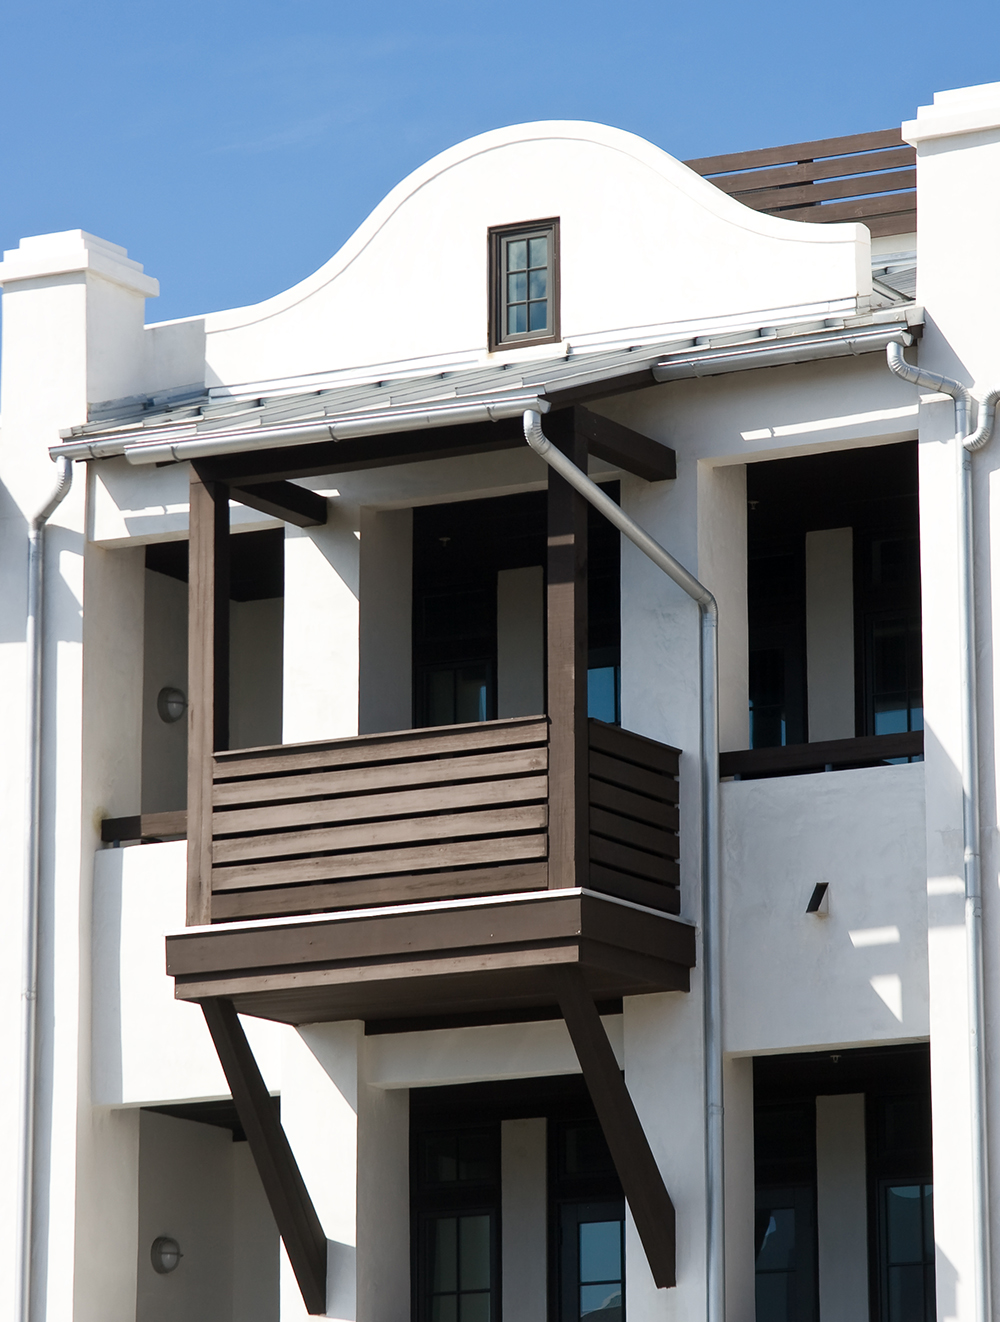 McNamara-Rosemary Beach-Tabby Lofts-Exterior-Parapet